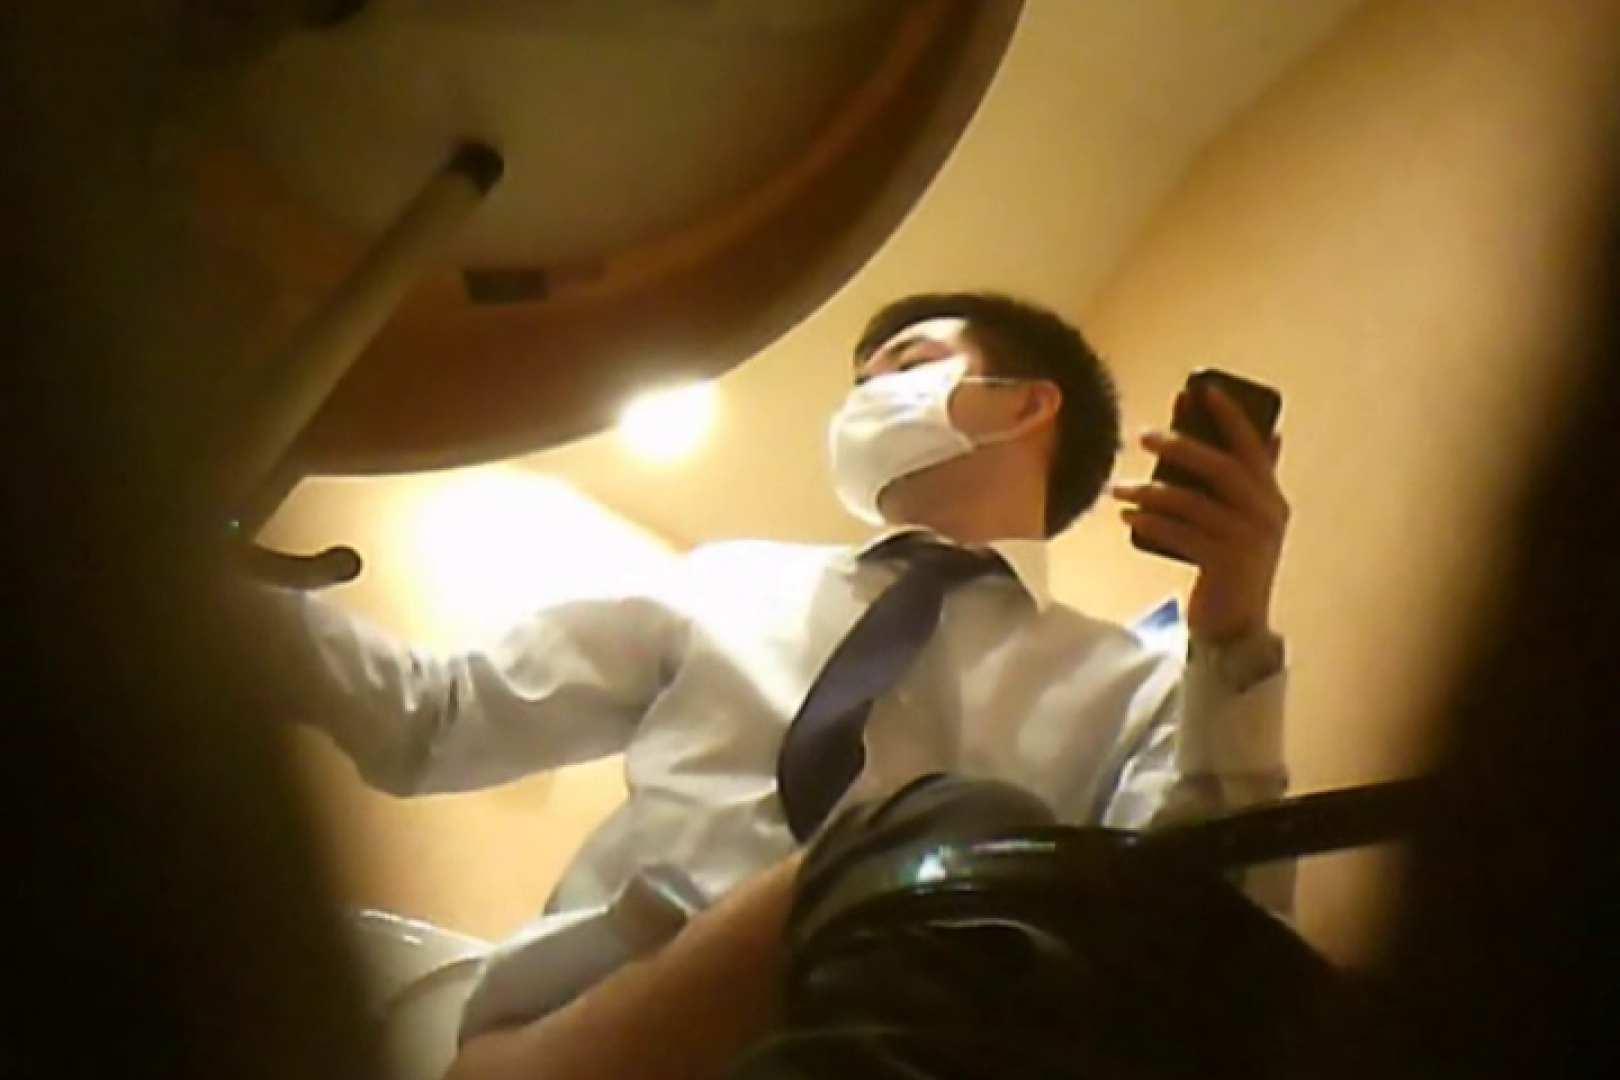 SEASON 3rd!掴み取りさんの洗面所覗き!in新幹線!VOL.02 スーツボーイズ | のぞき  102pic 54